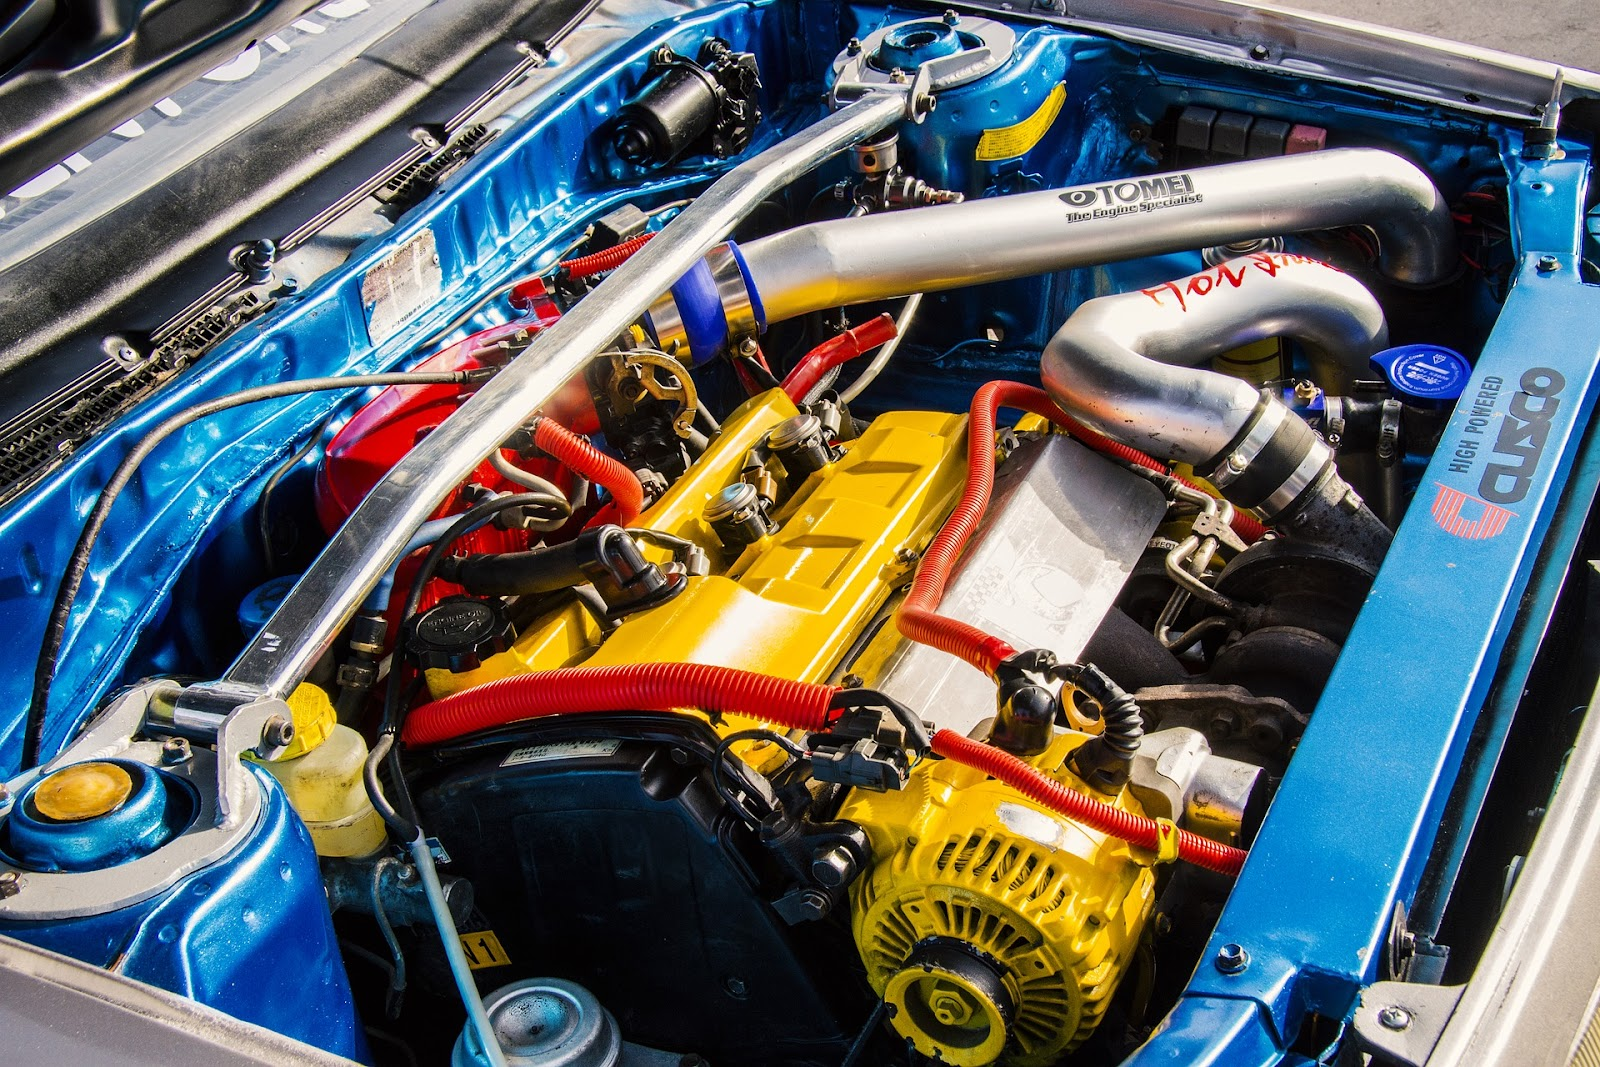 engine-2647973_1920.jpg